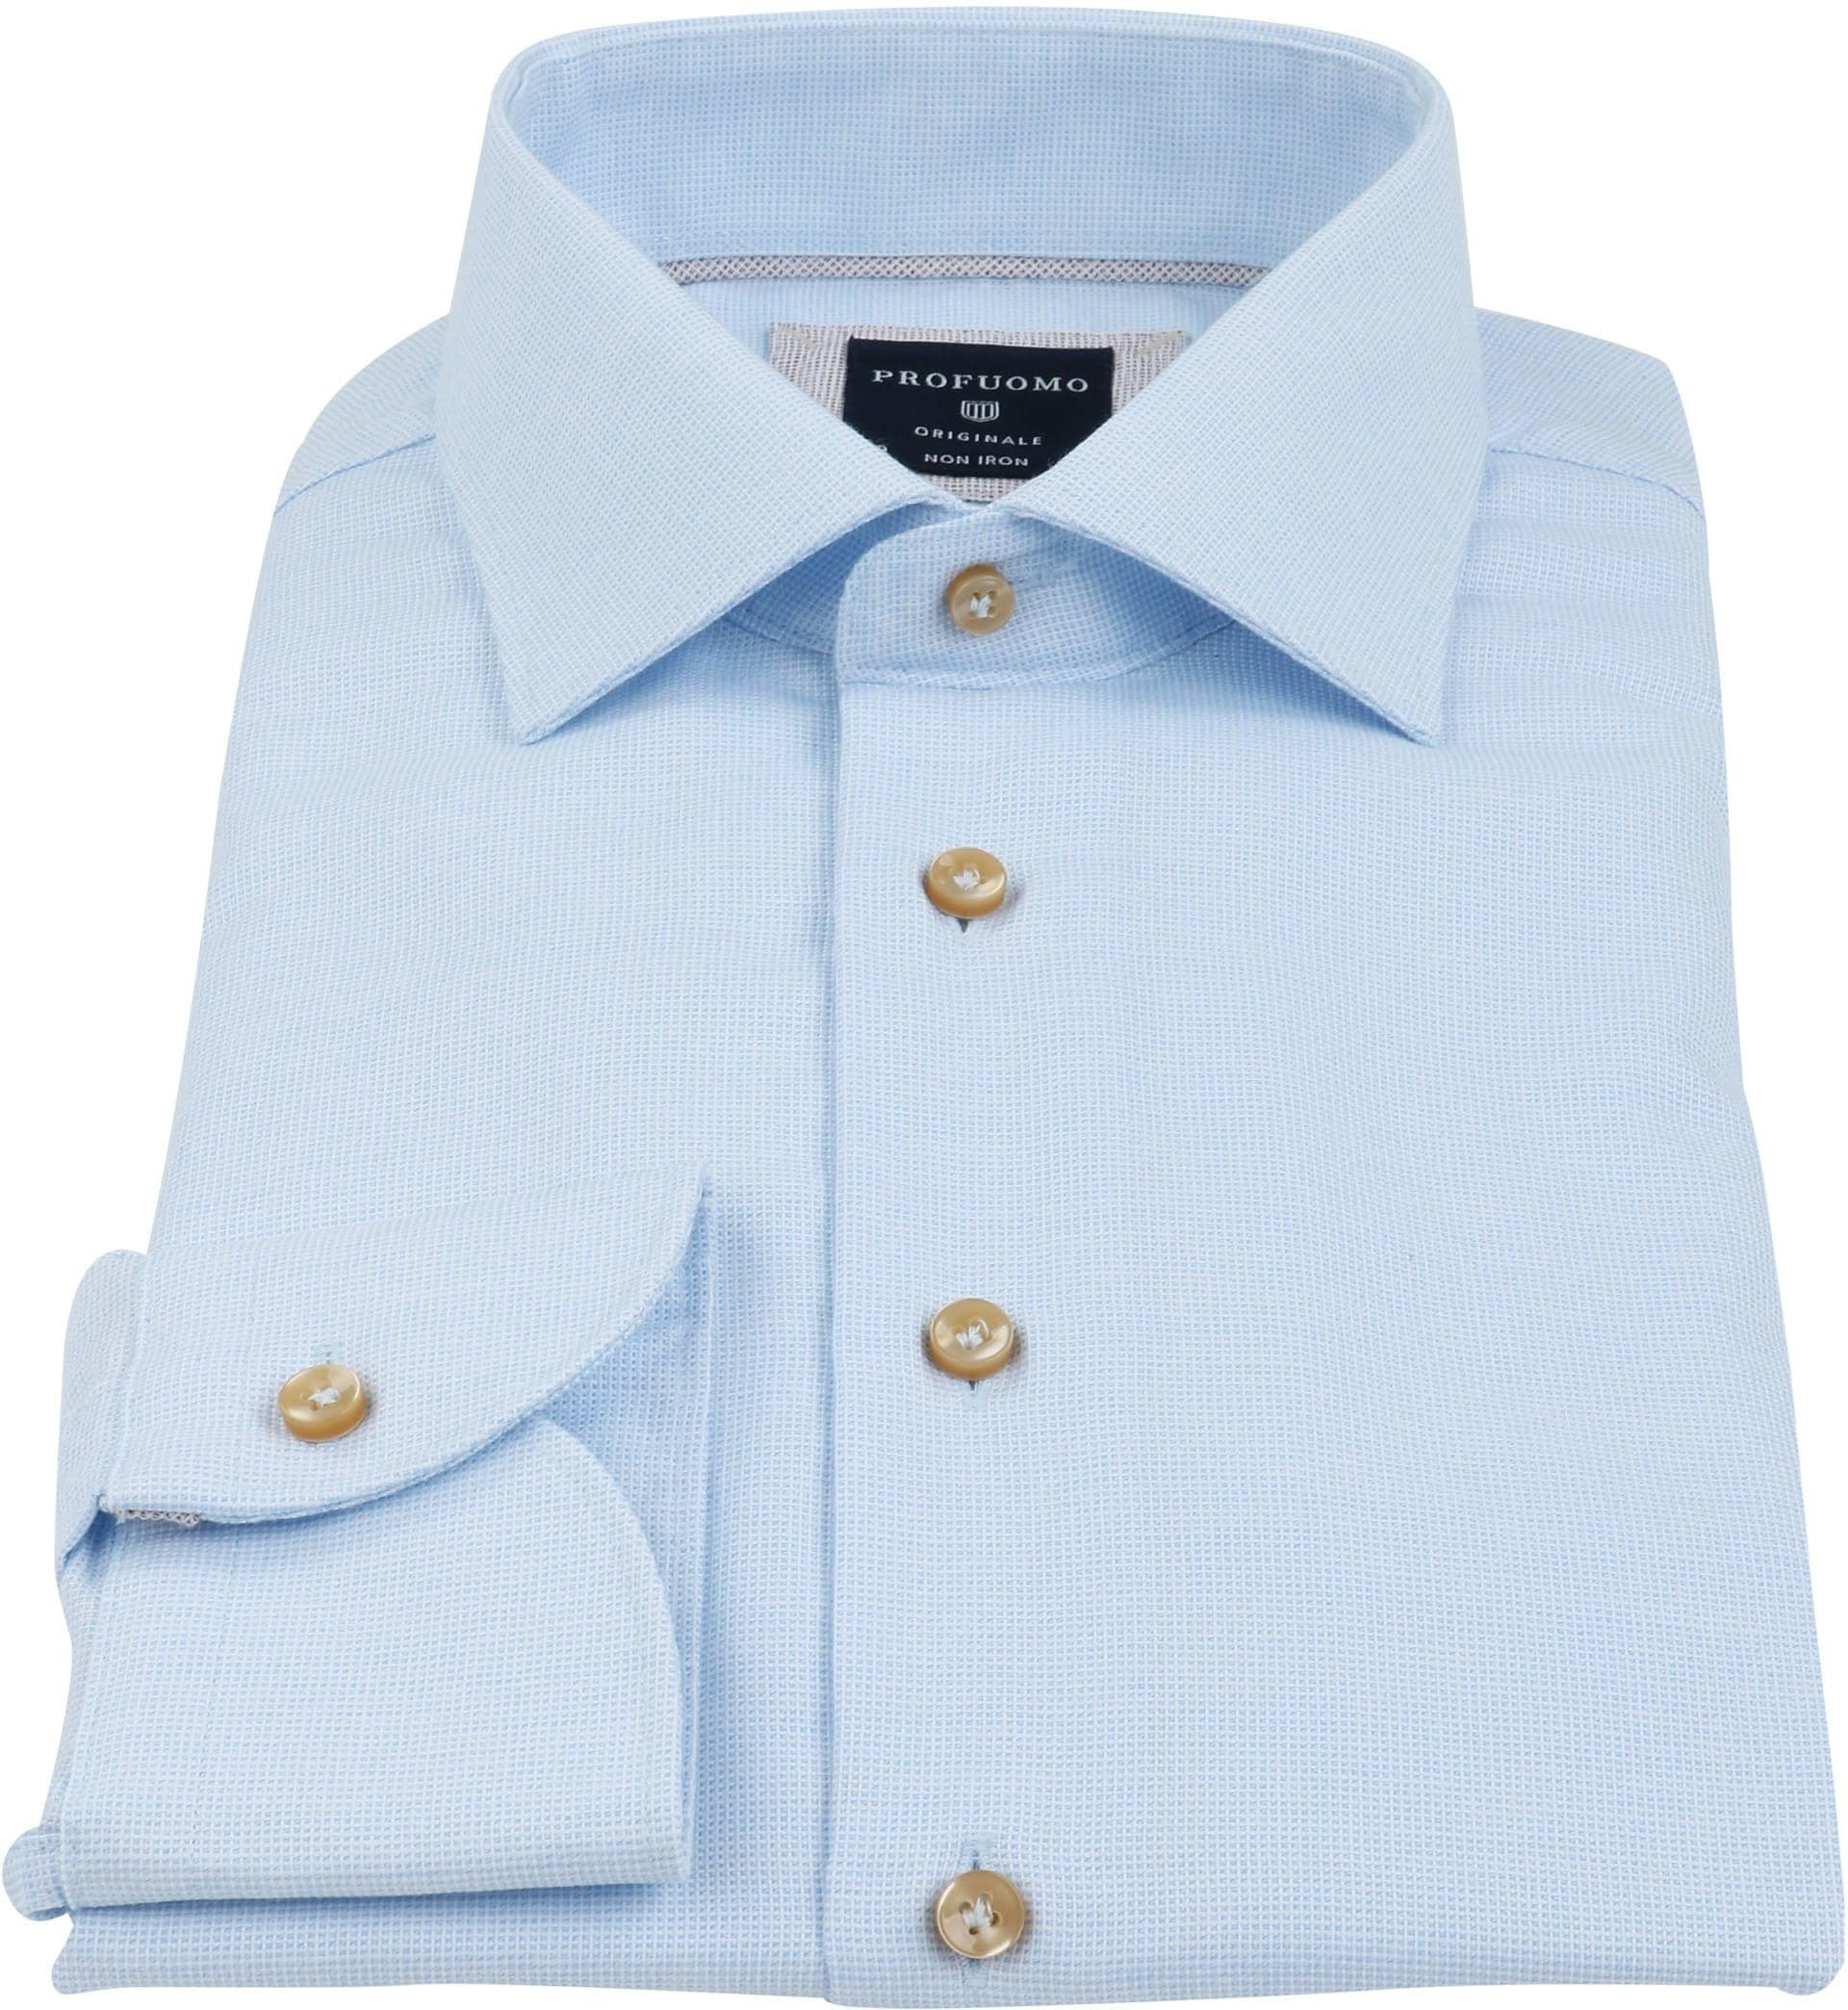 Profuomo Overhemd SF Blauw Ruit foto 2